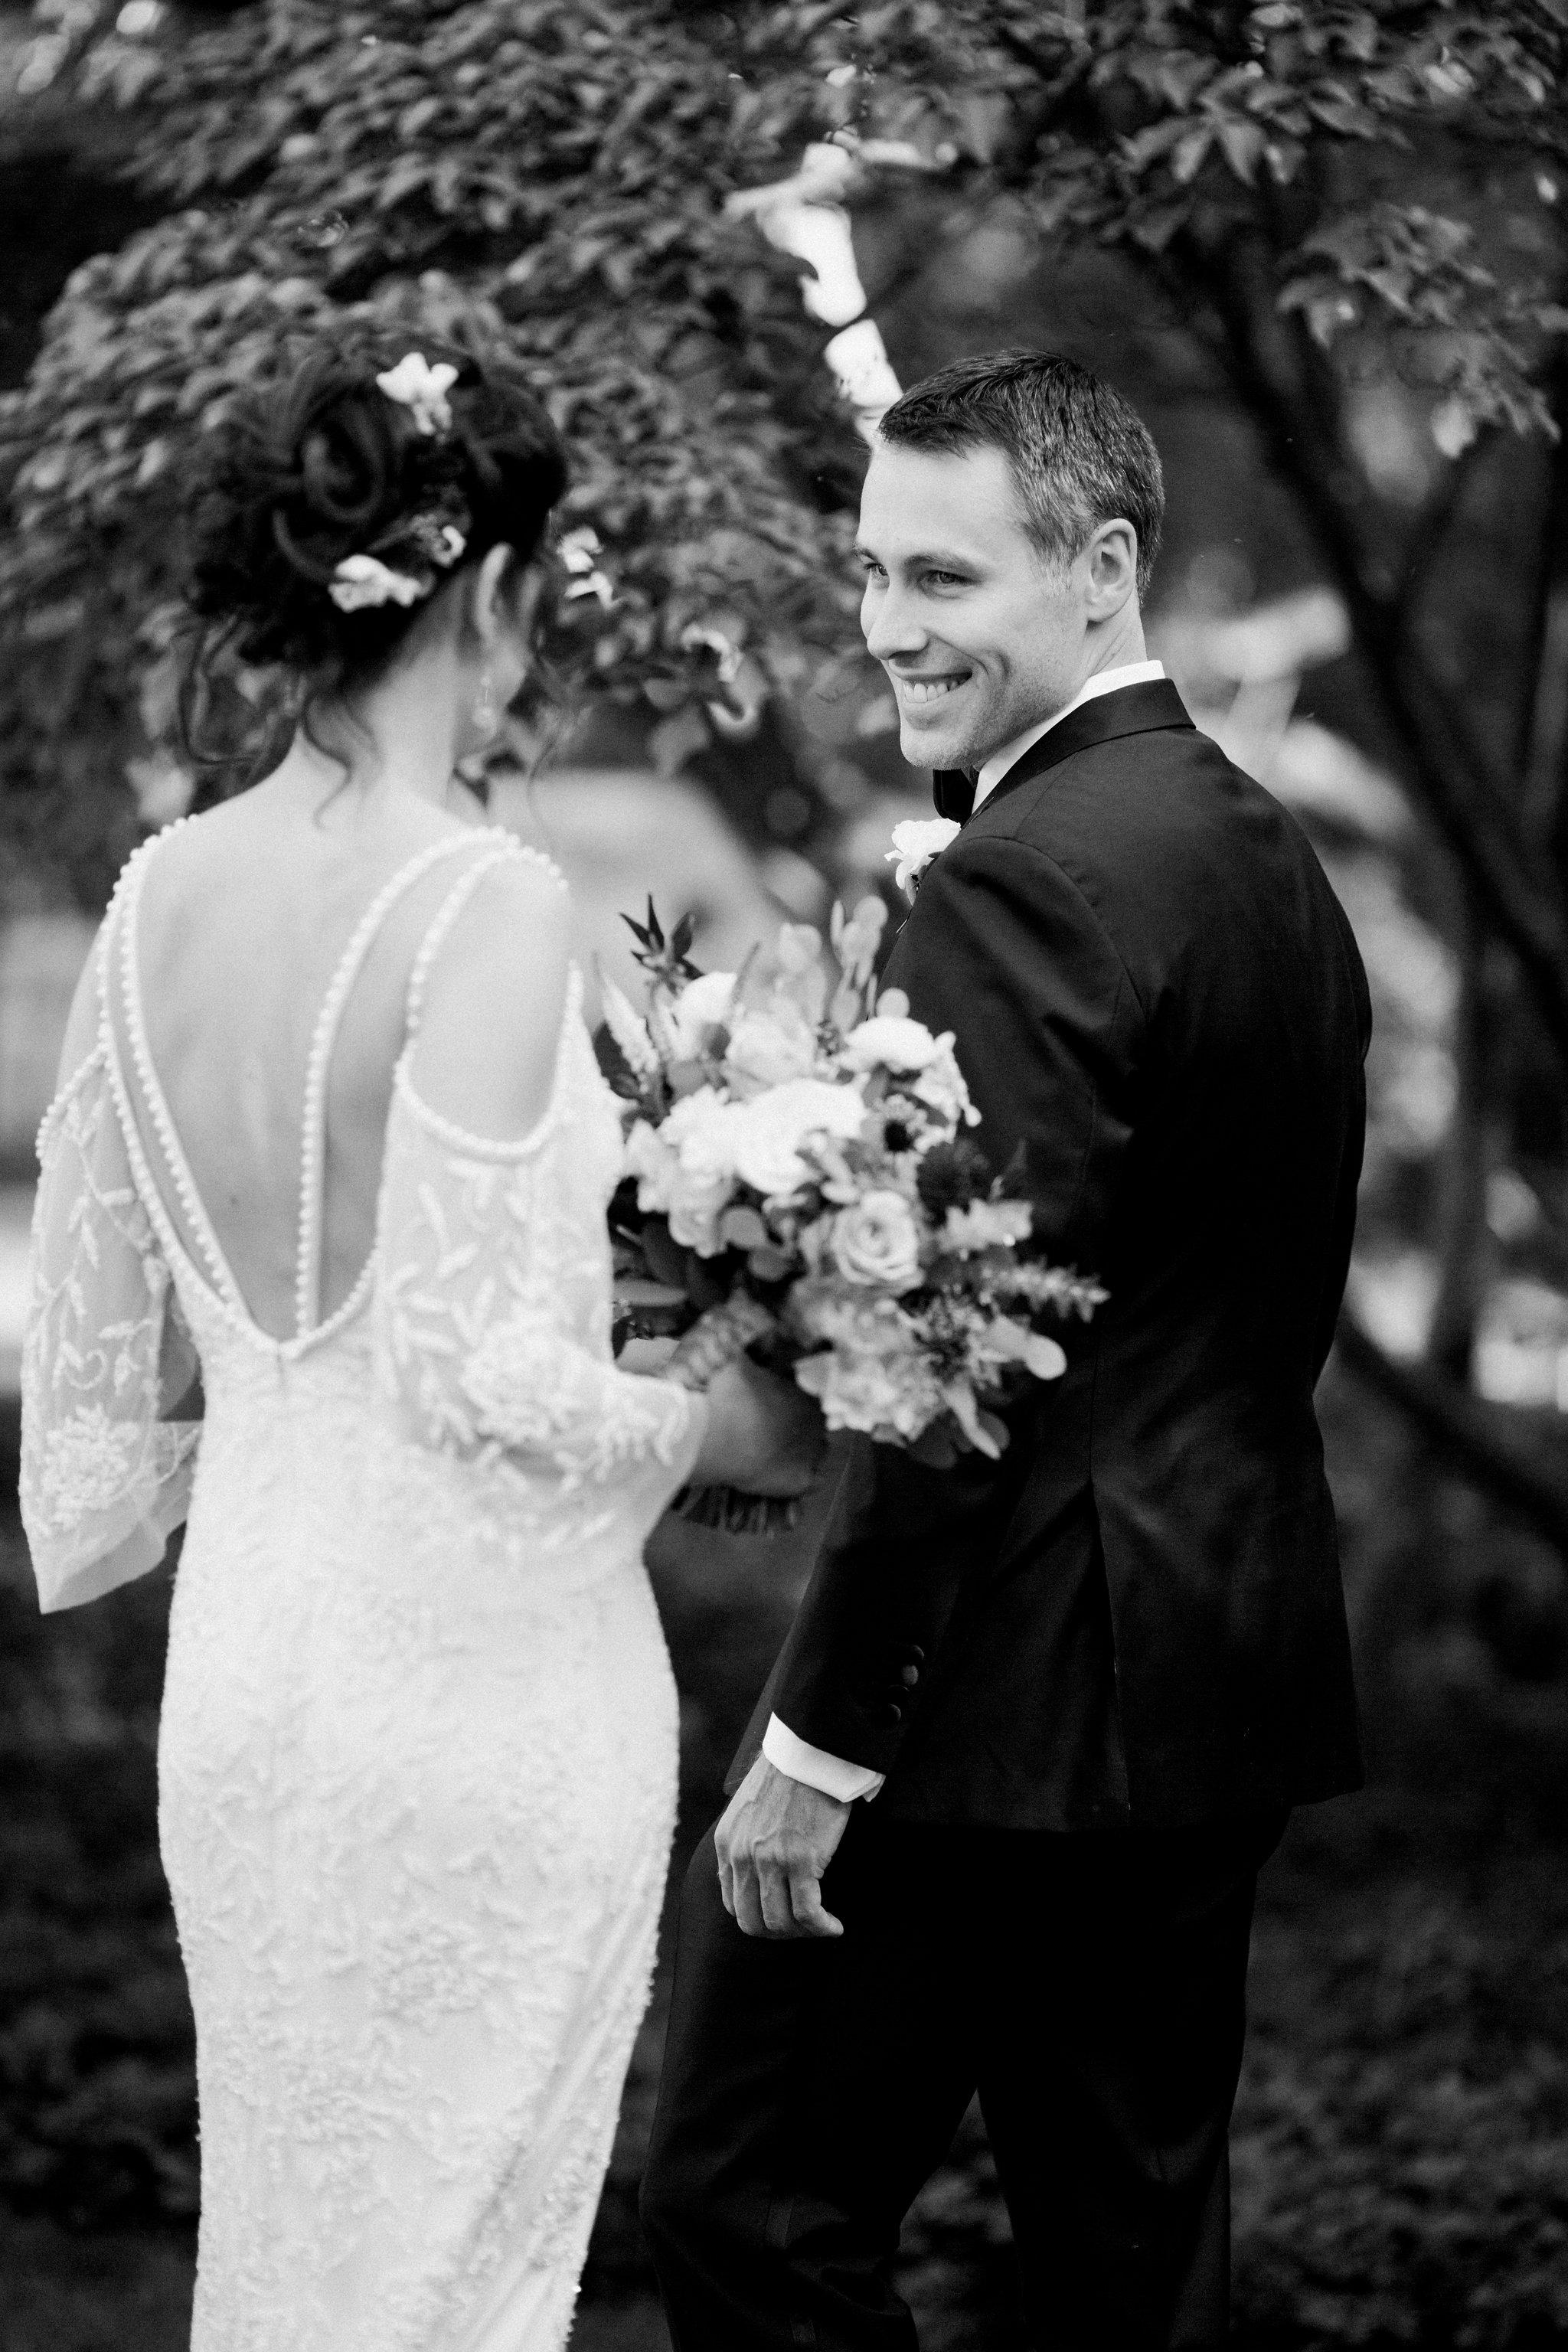 Stefanie-Stefan-Wedding-348.jpg